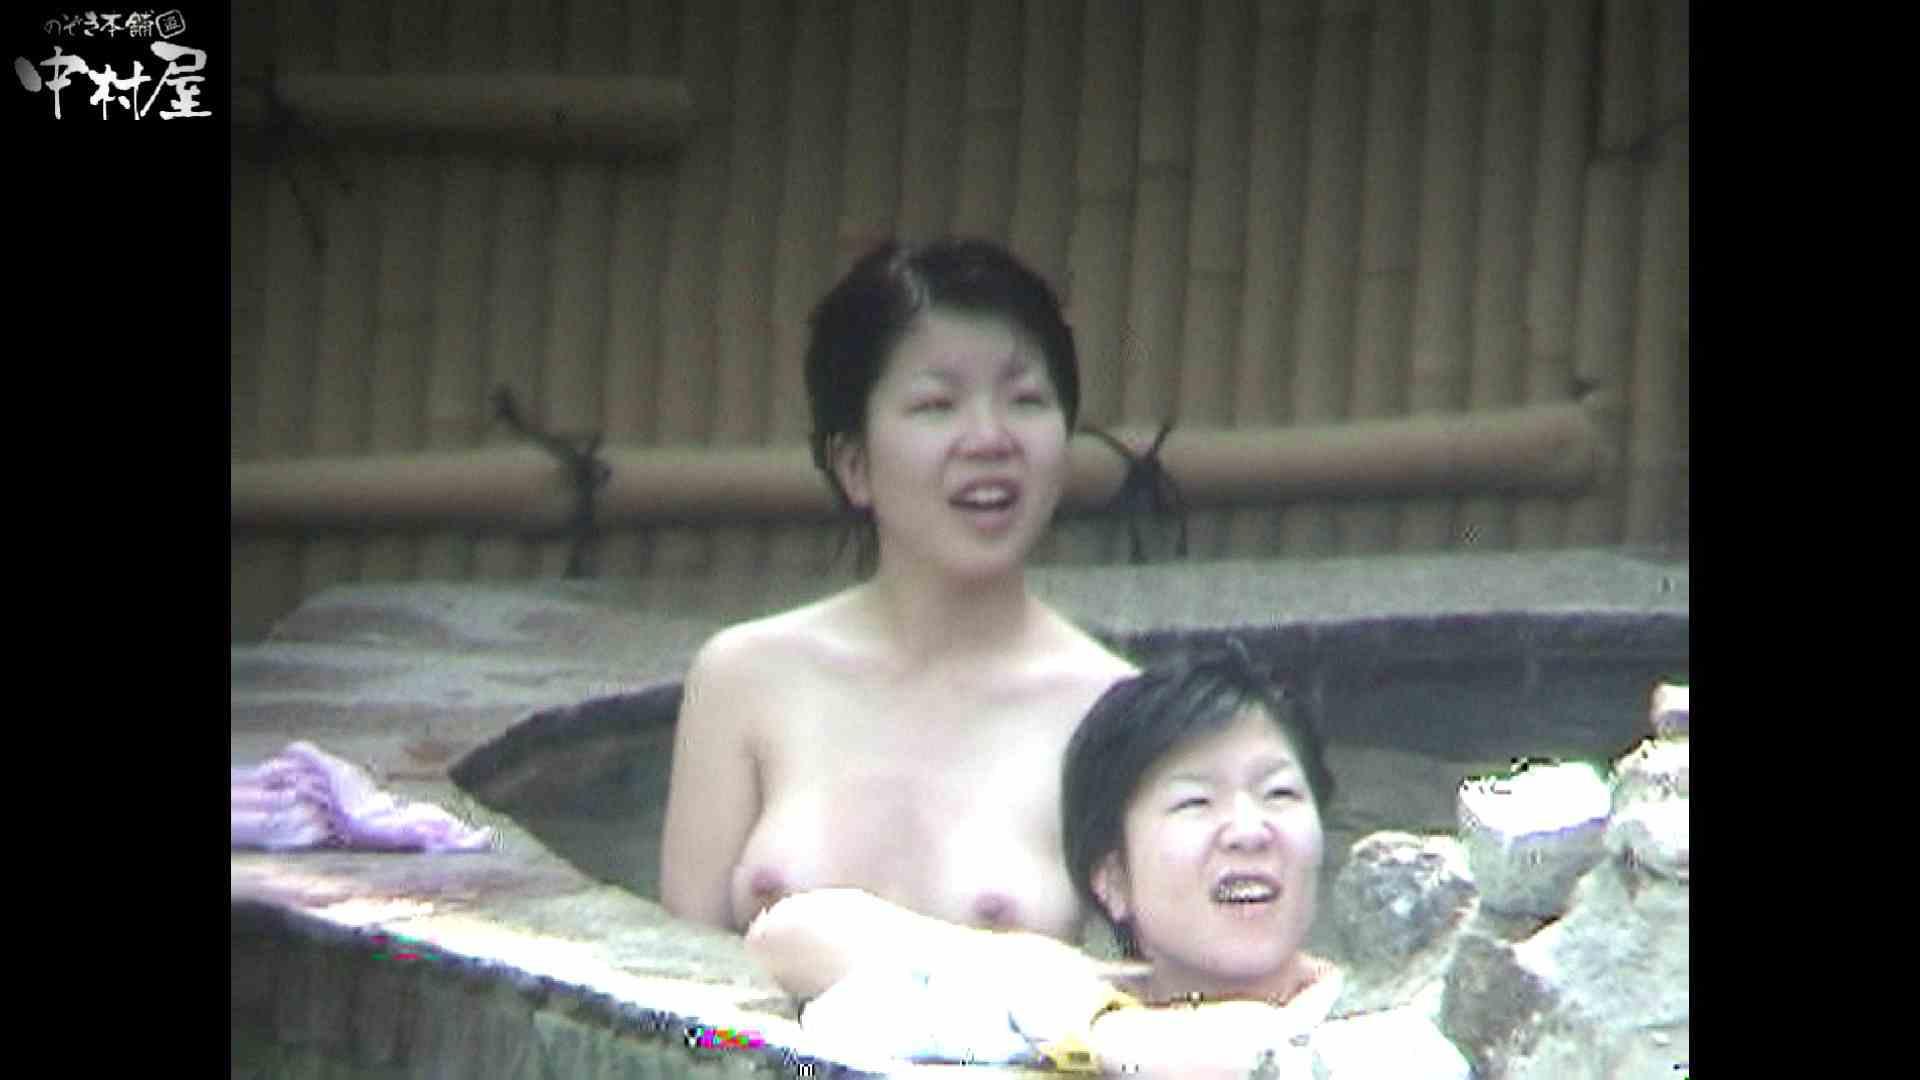 Aquaな露天風呂Vol.936 0 | 露天  85連発 5